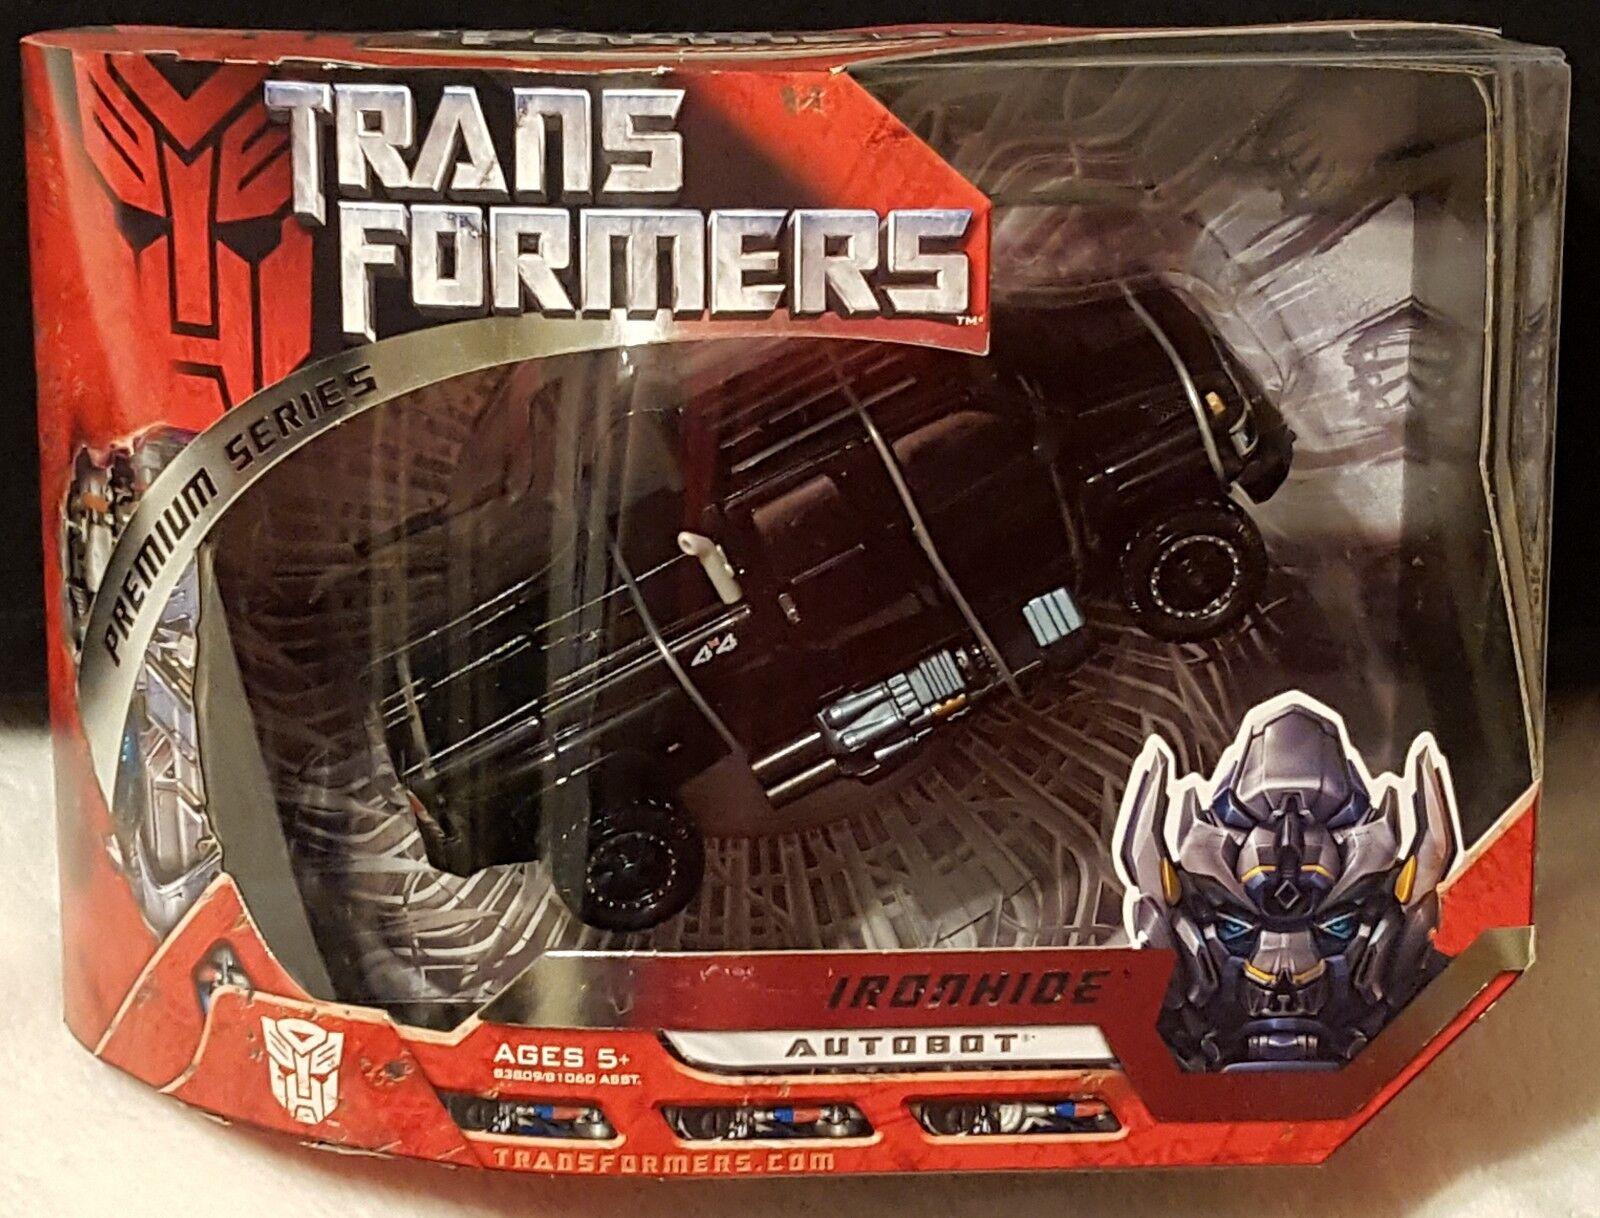 Ironhide Premium Serie Autobot Figuras De Acción De Transformers Voyager Class